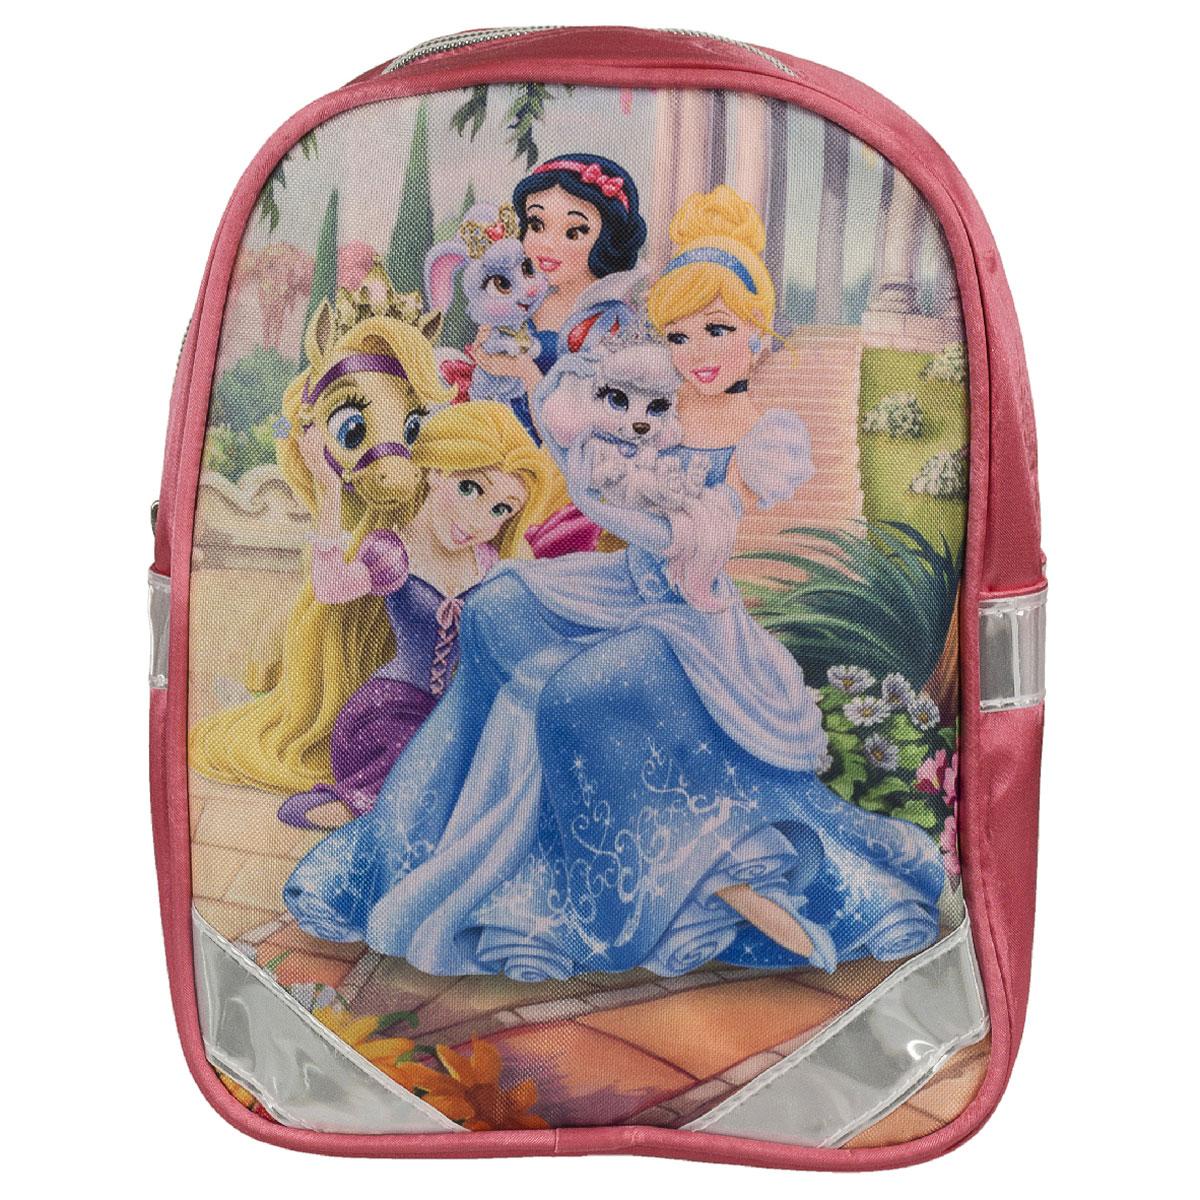 Рюкзак детский Kinderline Princess, цвет: розовый сумка kinderline international mhbz us1 51box5 v3